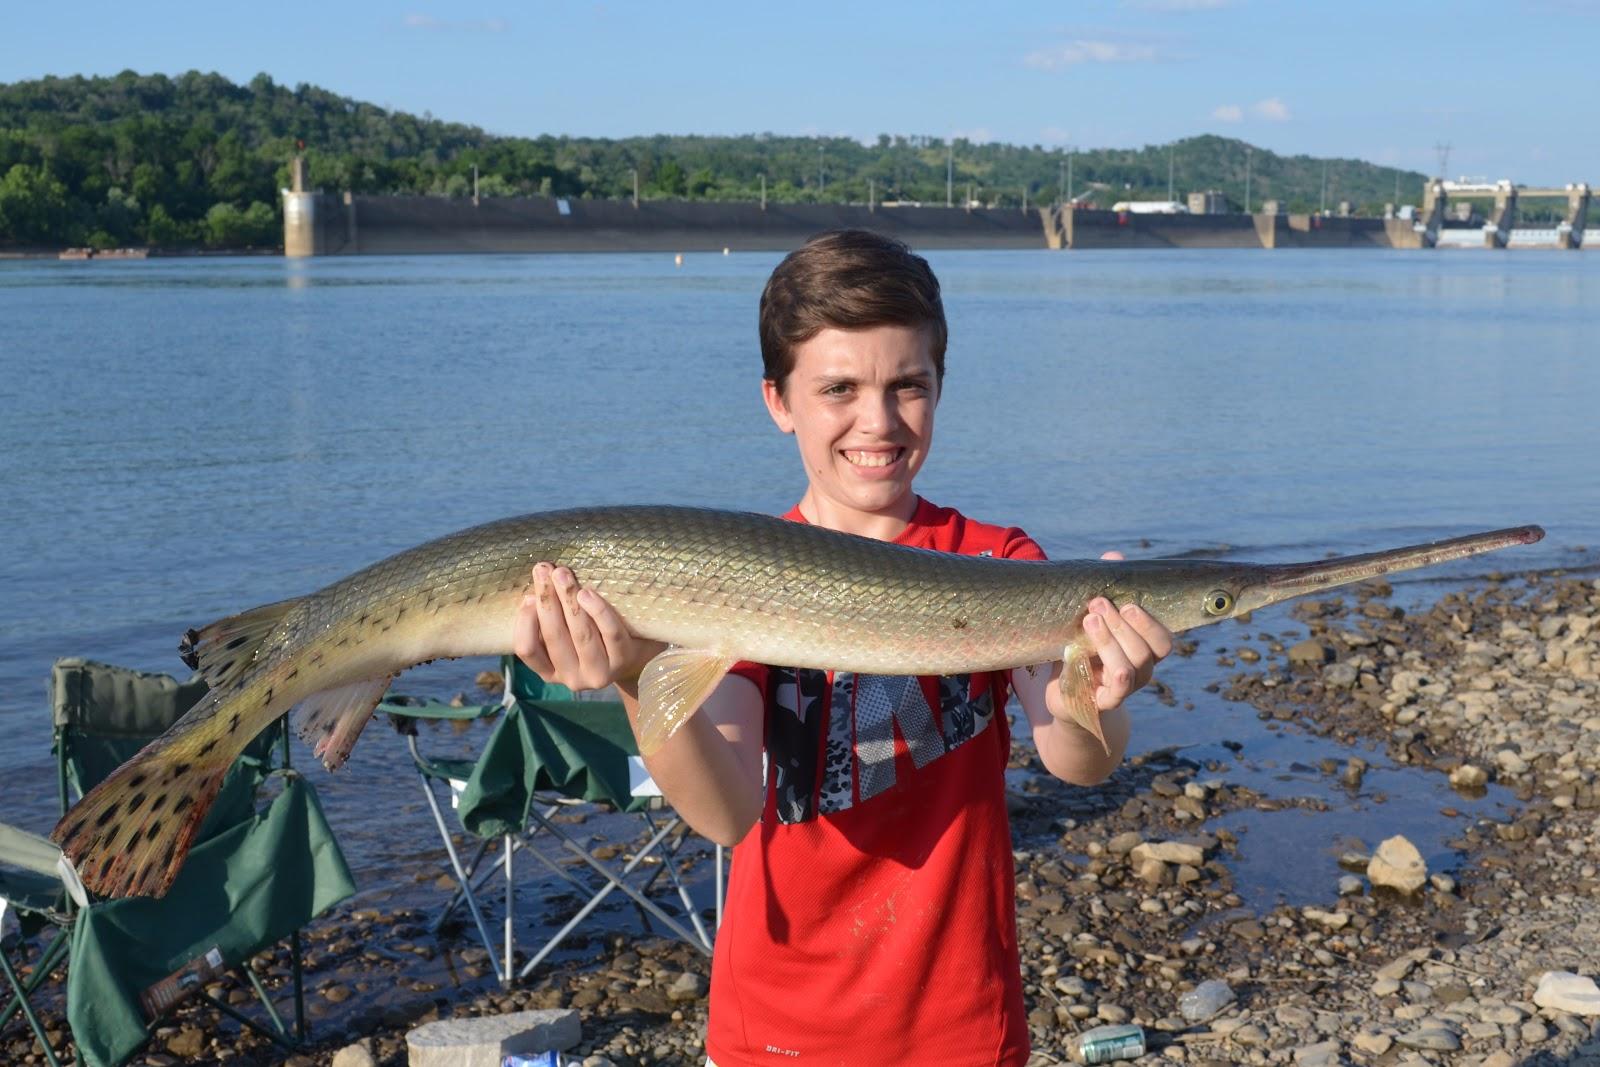 Canoeing in ohio for Fishing in ohio